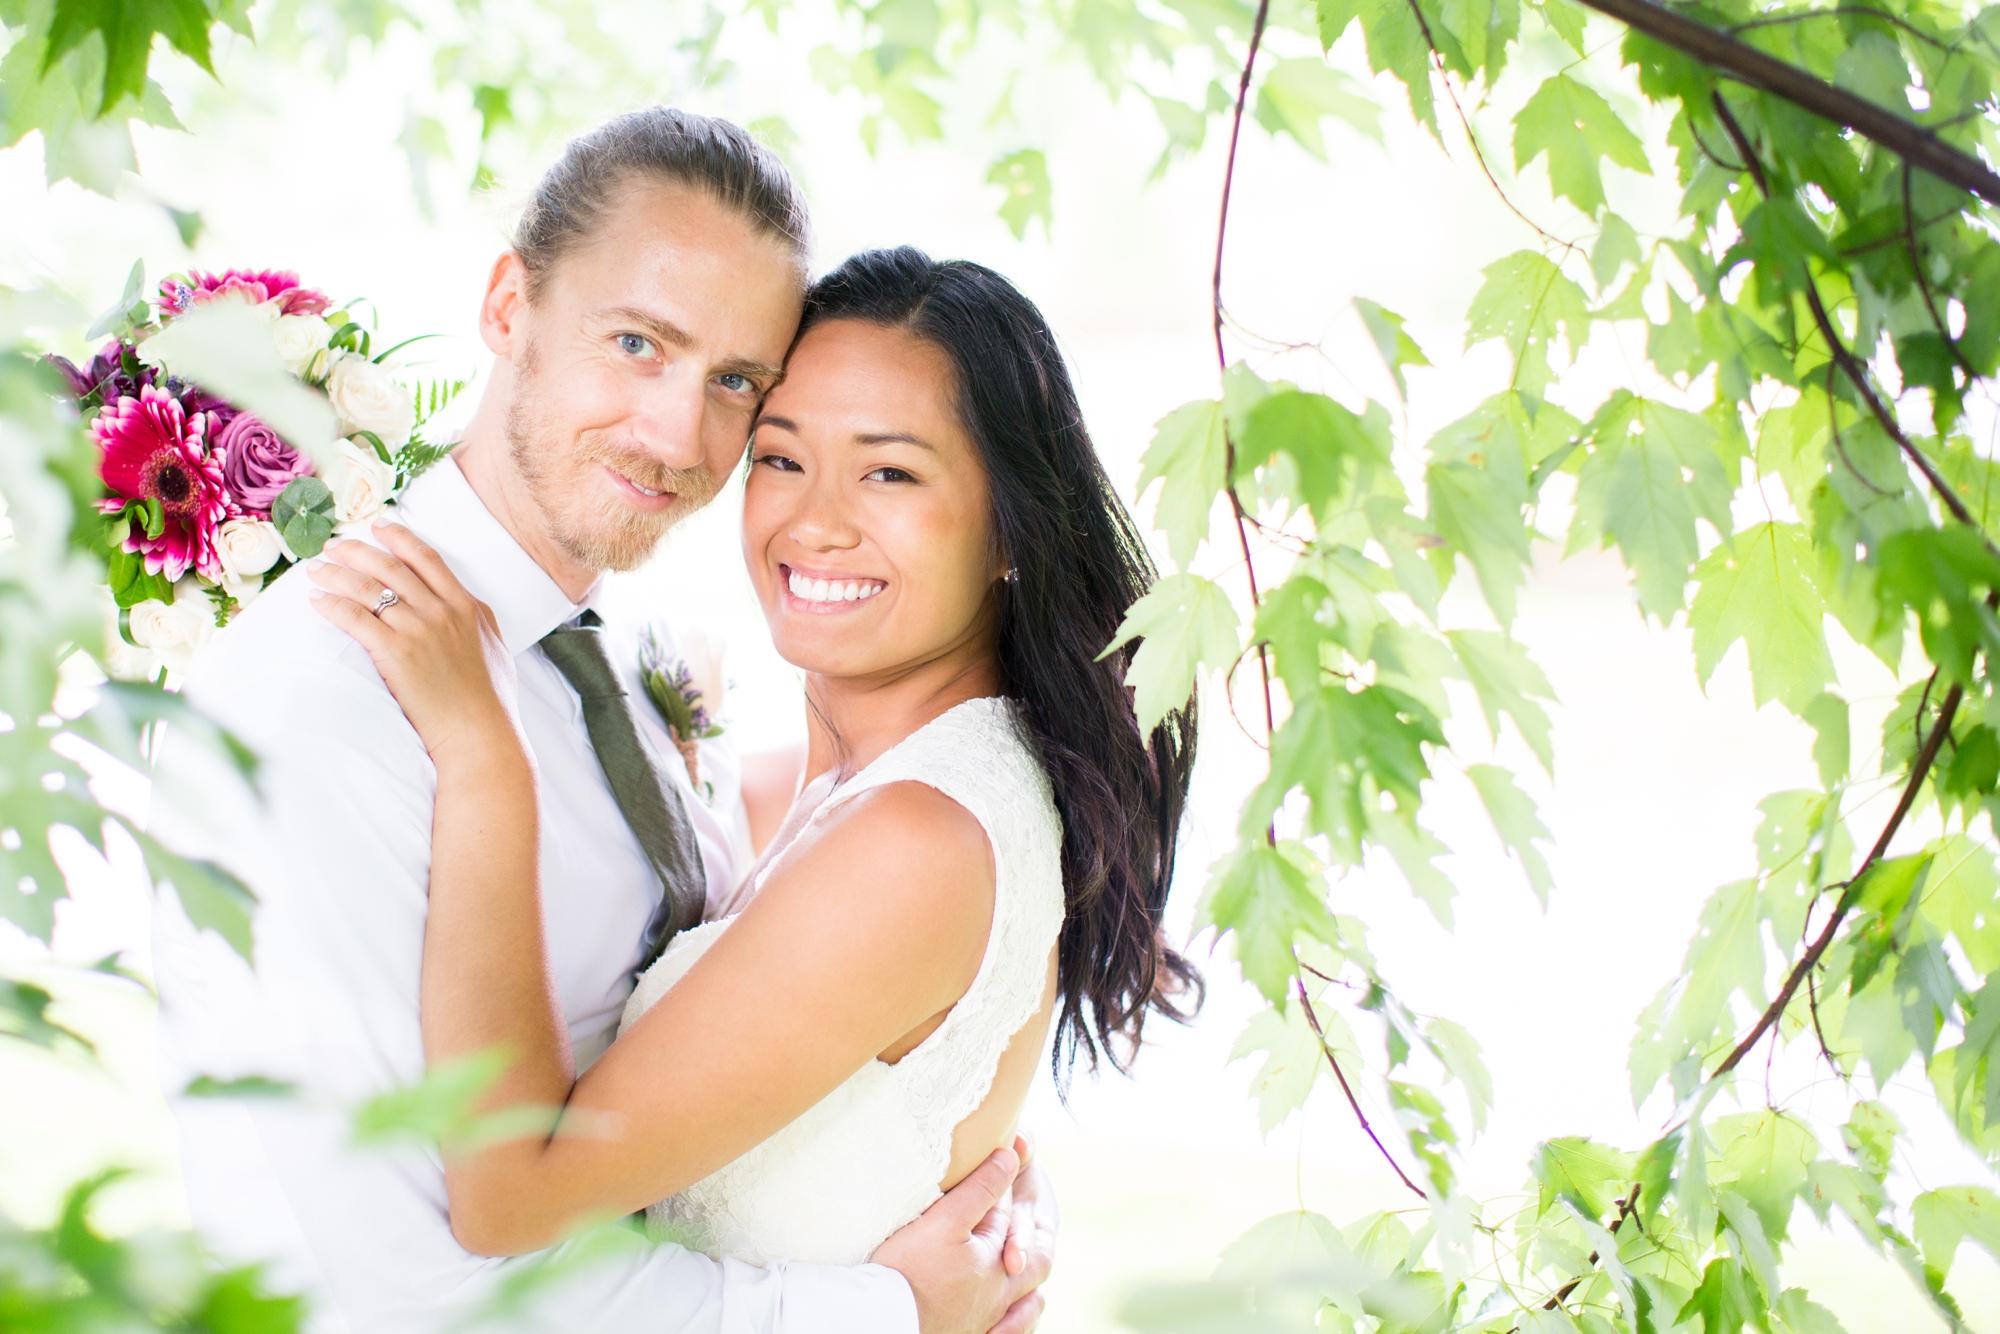 2-Hamby Wedding Bride & Groom Portraits-530_annagracephotography maryland wedding photographer genesee valley.jpg